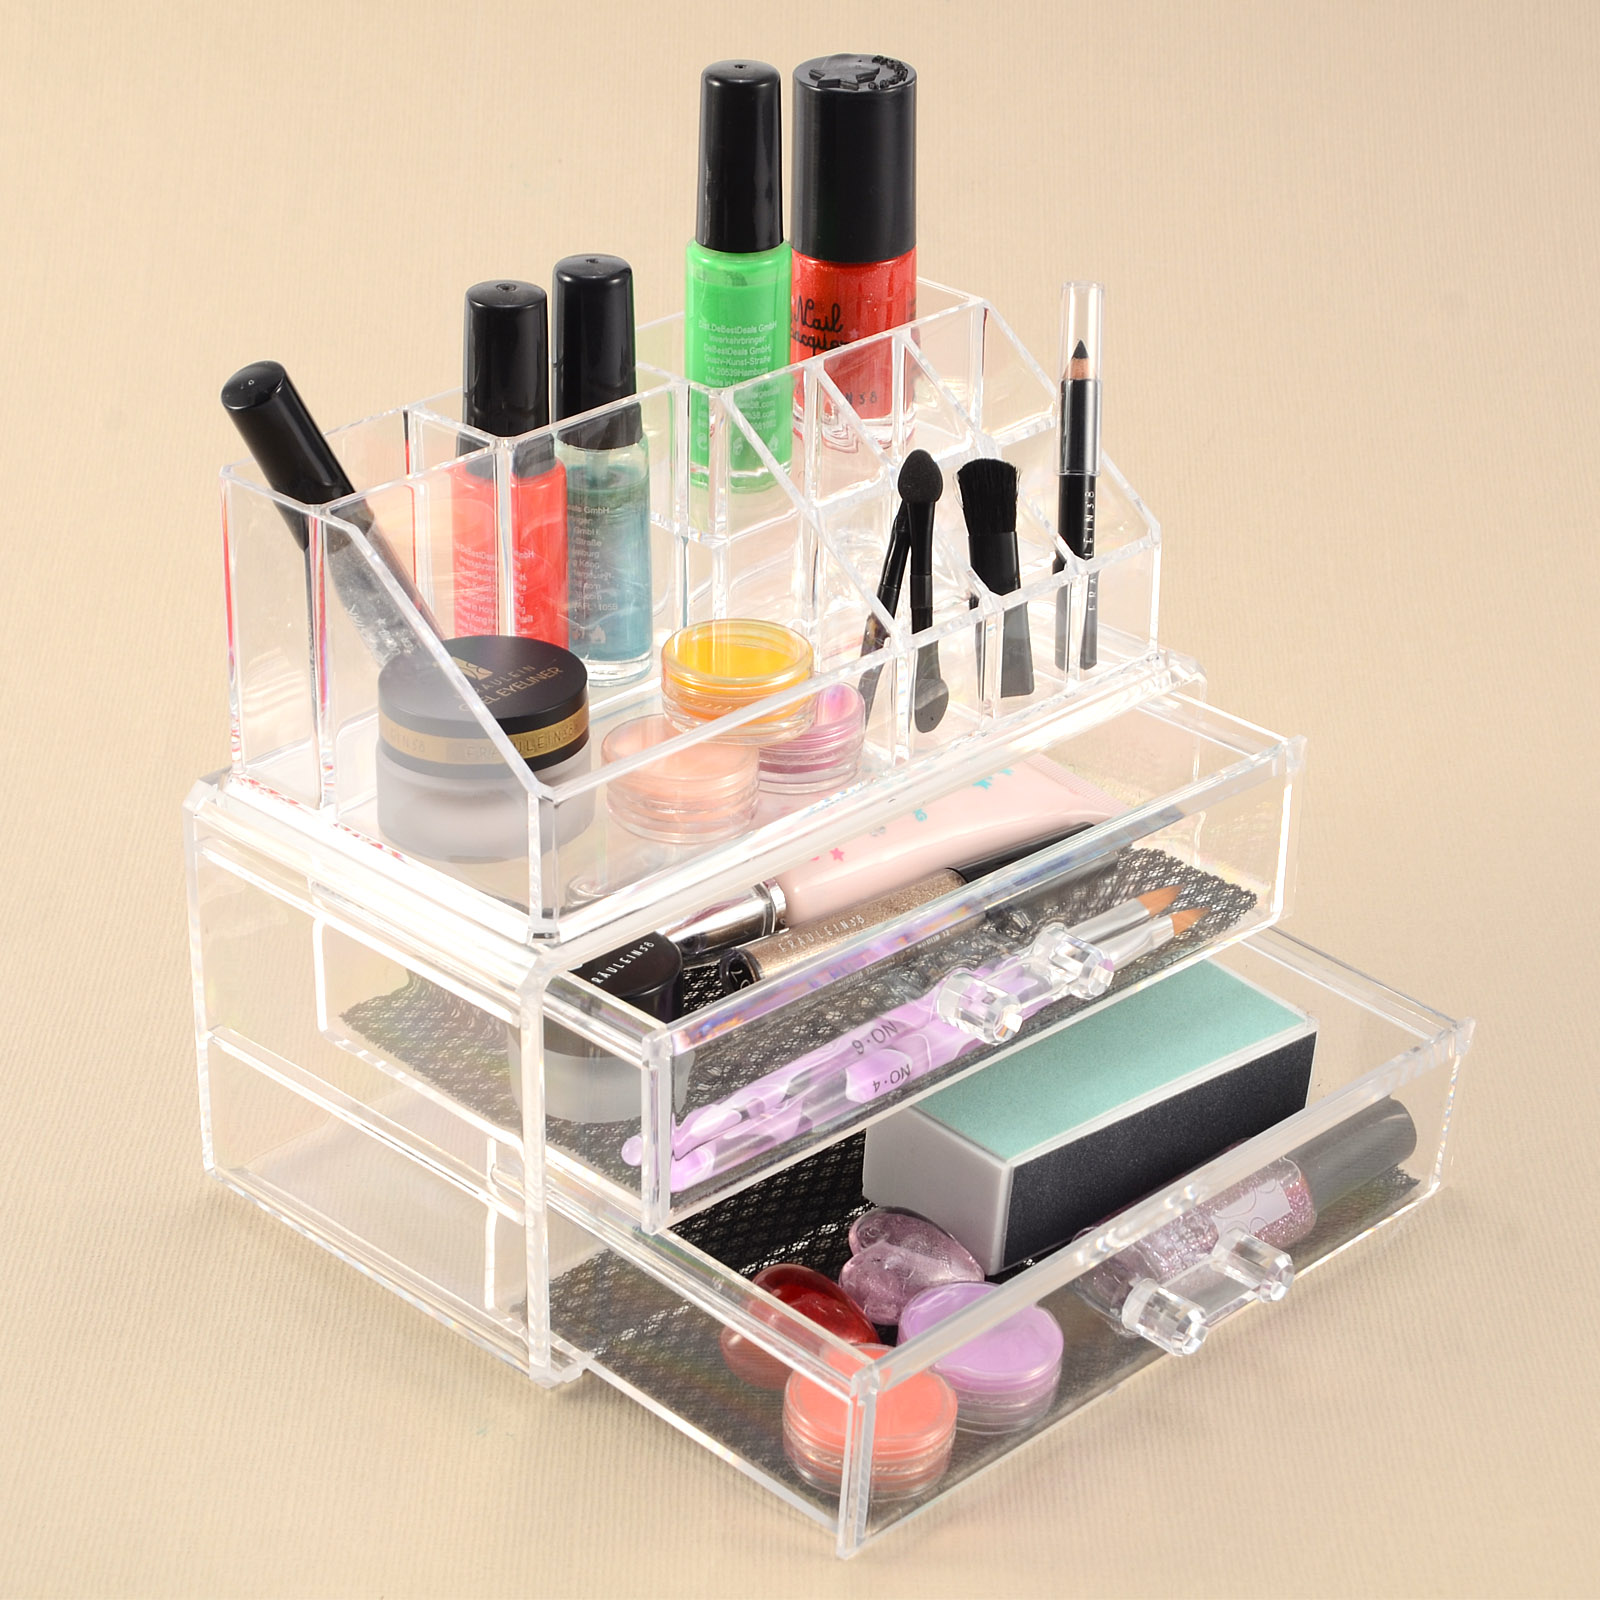 acryl kosmetik organizer schublade aufbewahrung make up. Black Bedroom Furniture Sets. Home Design Ideas